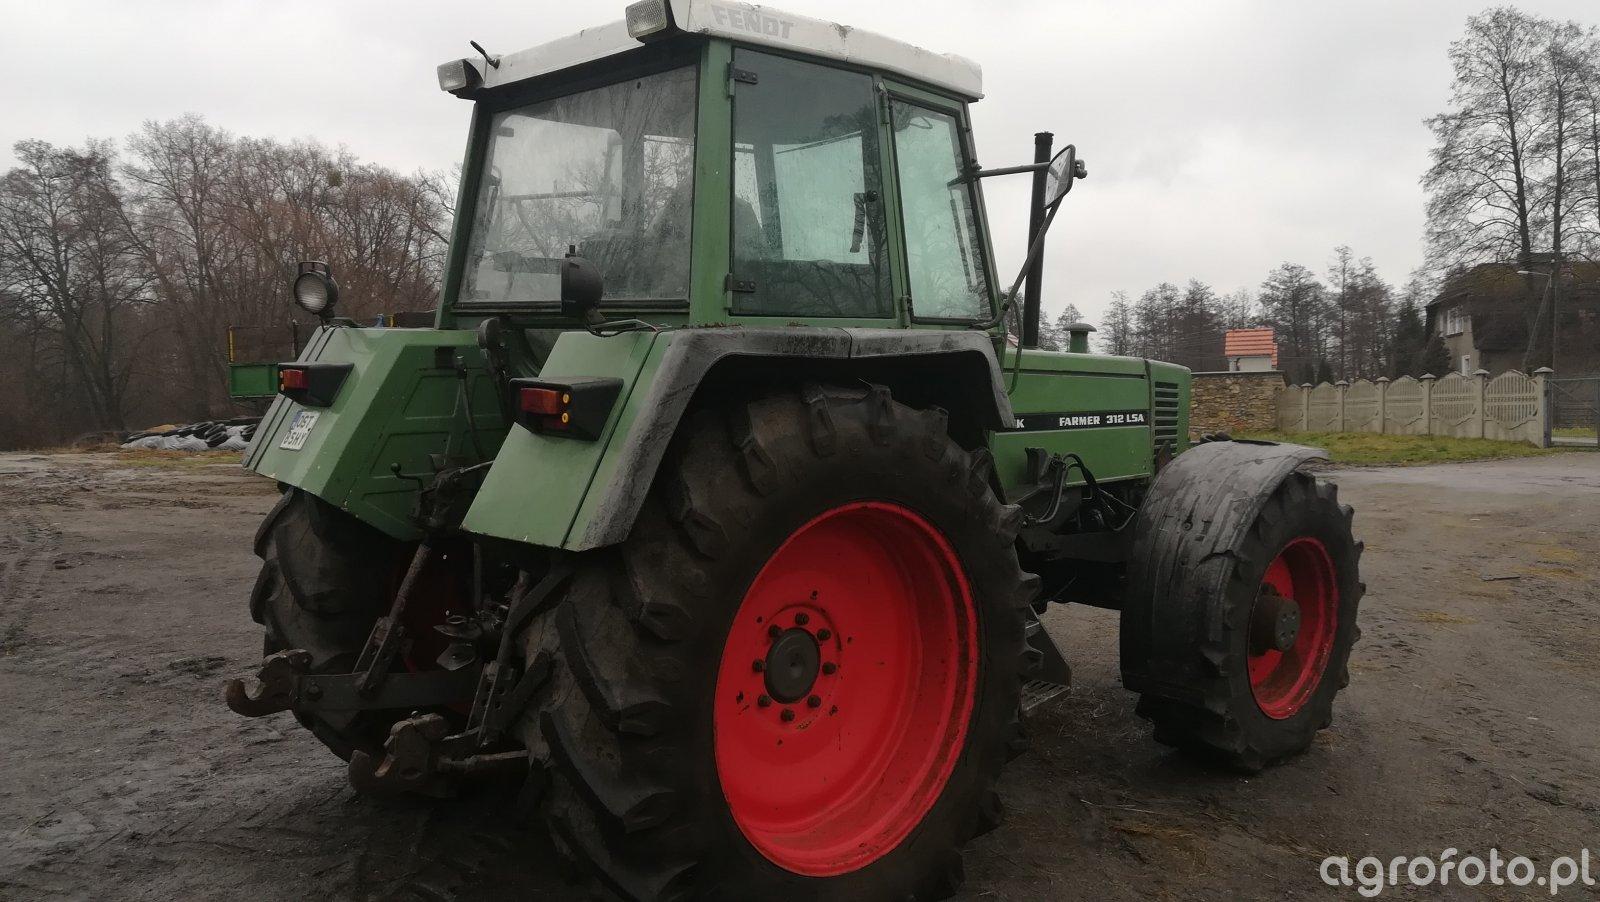 Fendt Farmer 312 LSA